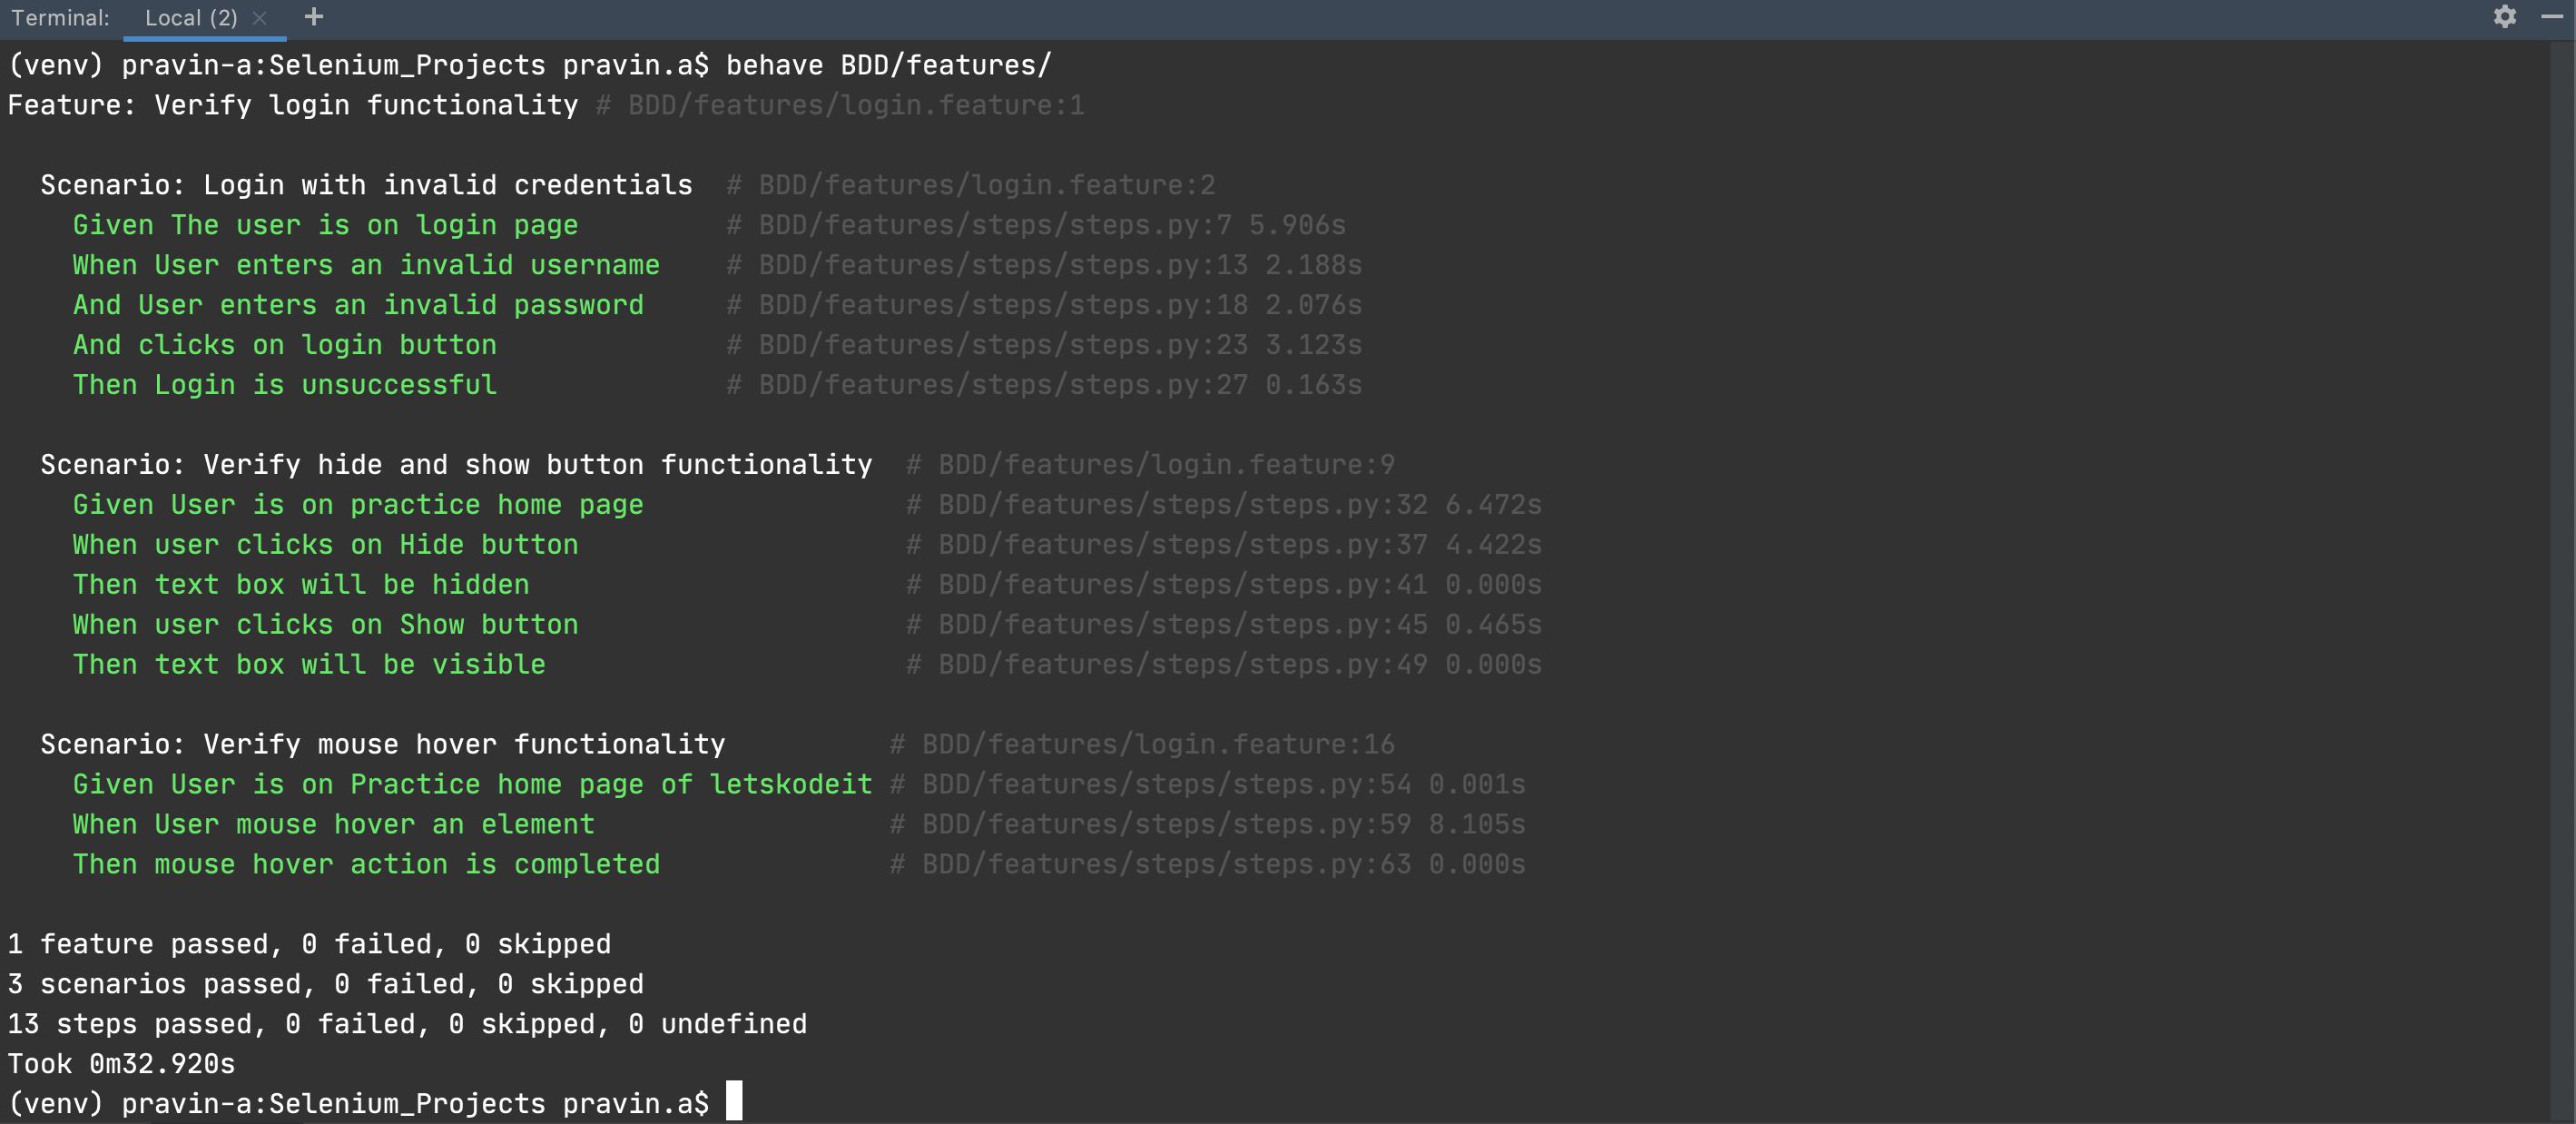 Selenium_Projects